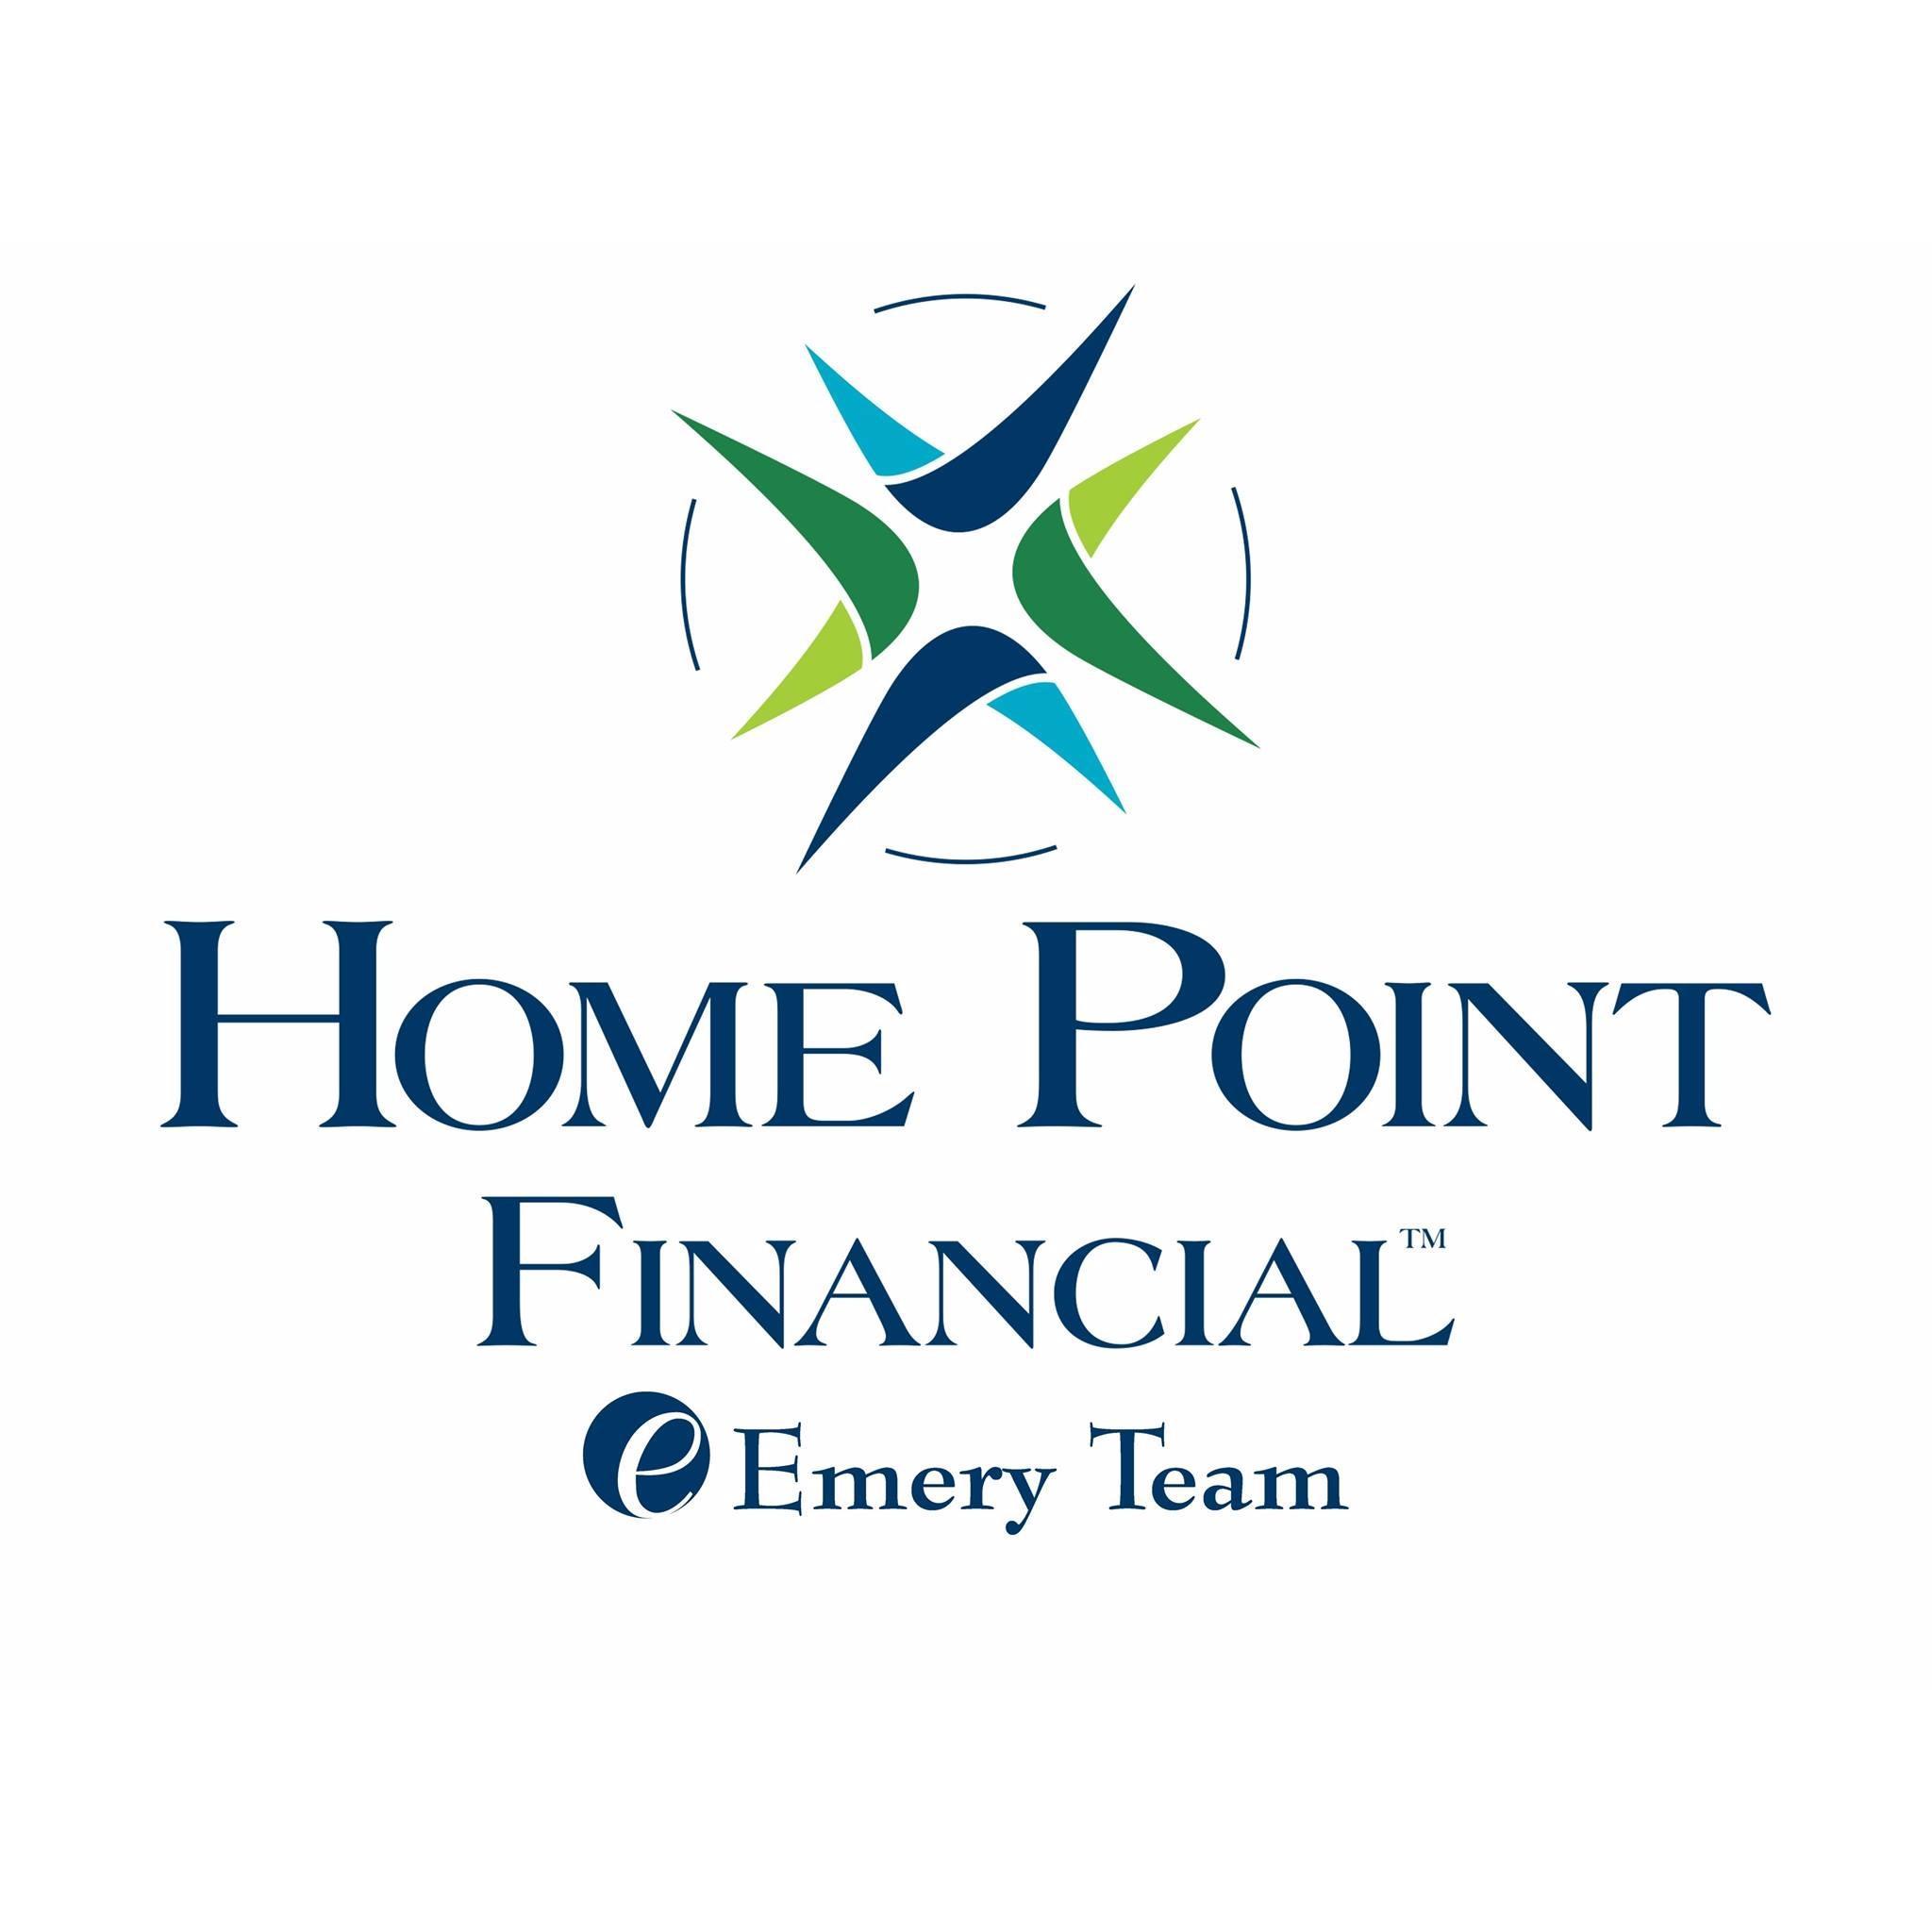 Rene Ruiz - Home Point Financial